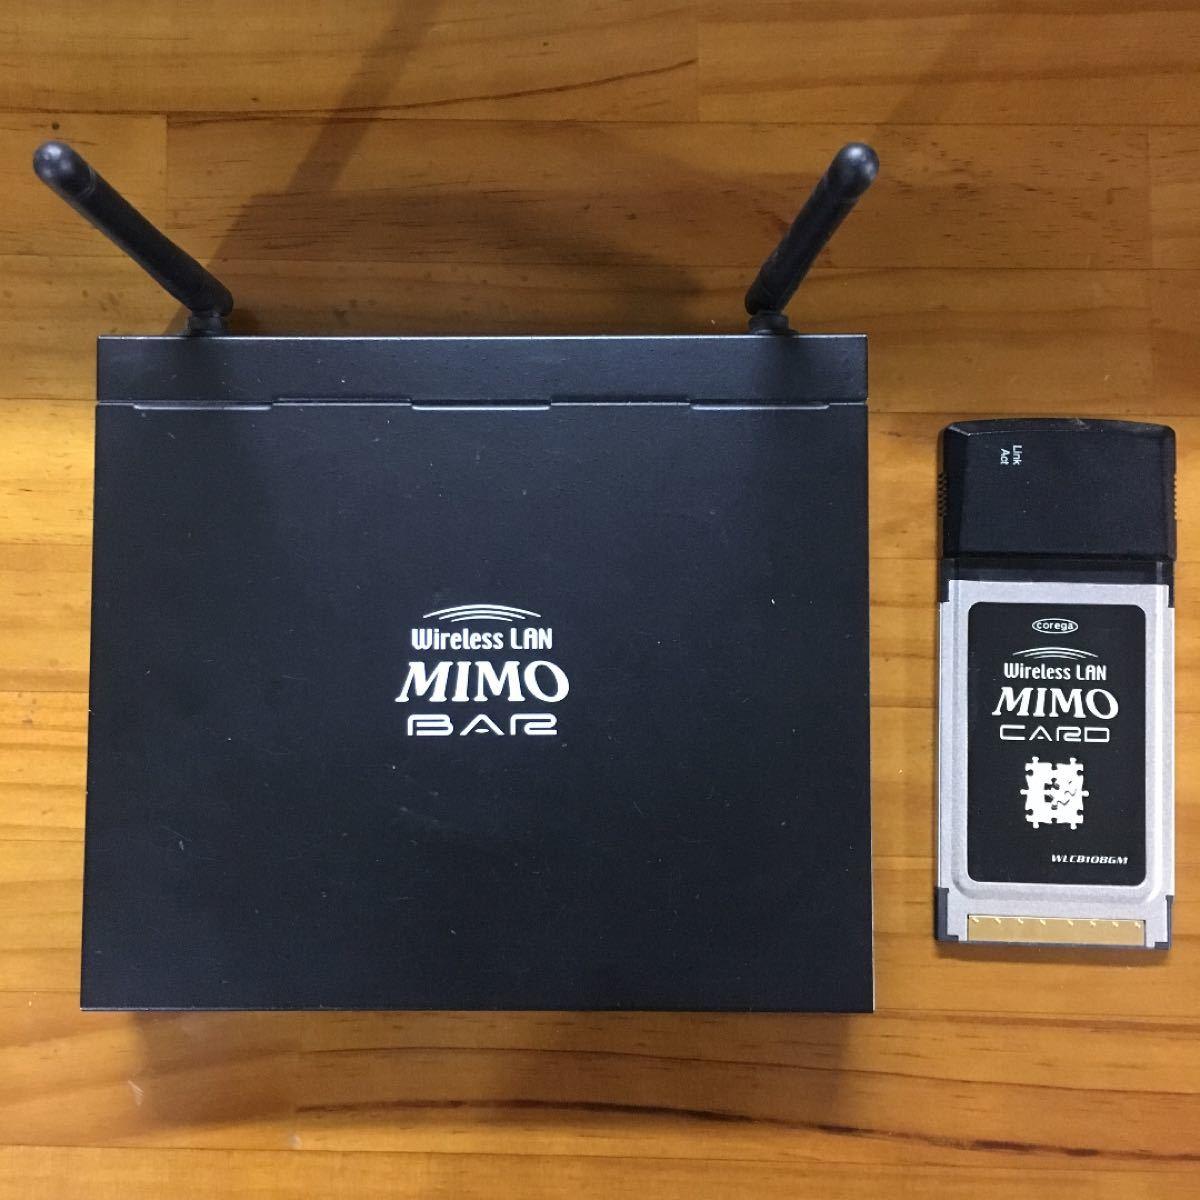 corega製無線ブロードバンドルータ+子機カードセット